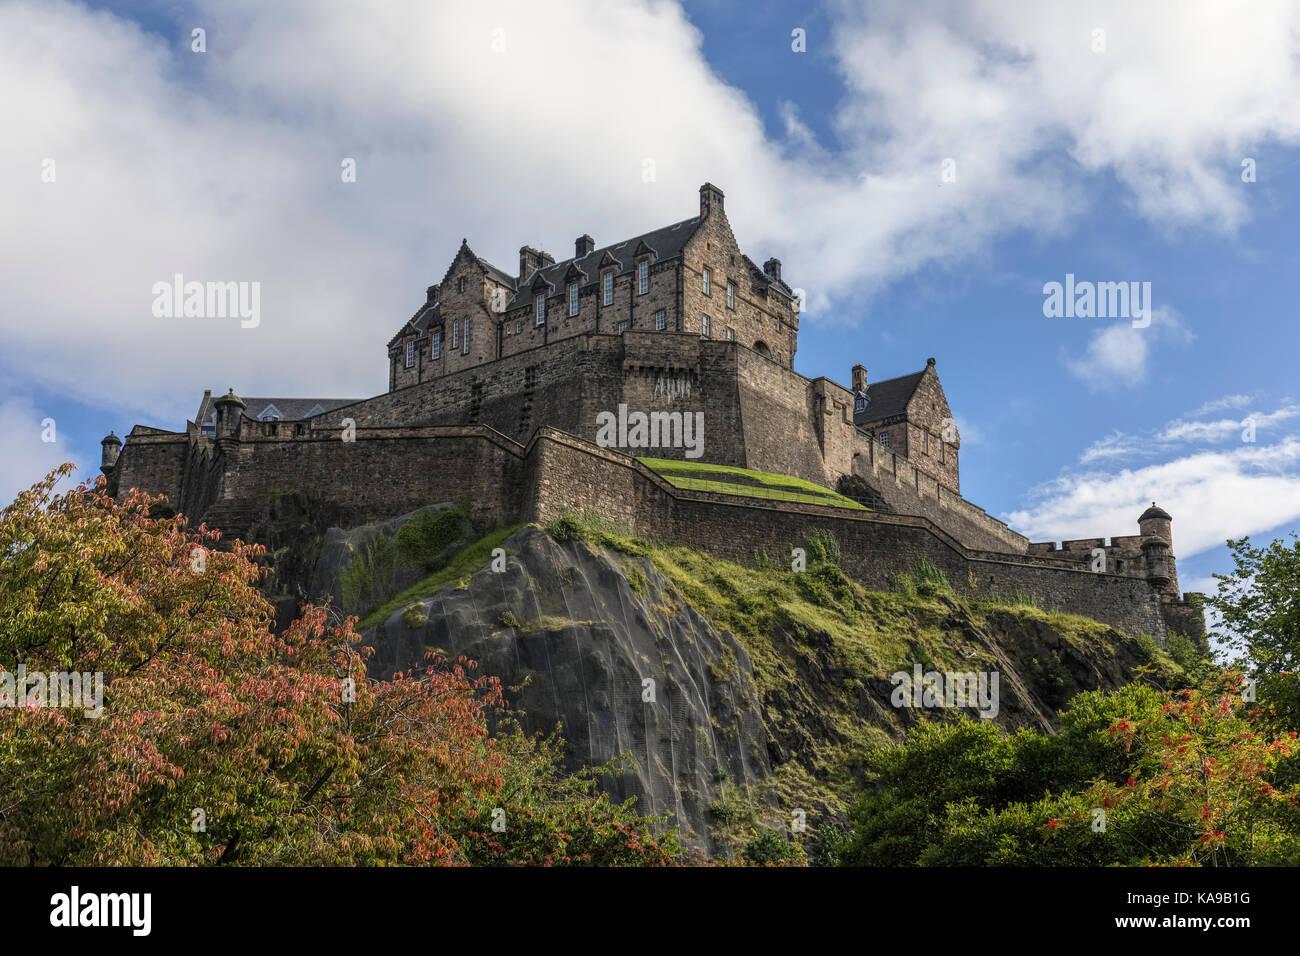 El castillo de Edimburgo, Lothian, Escocia, Reino Unido Imagen De Stock